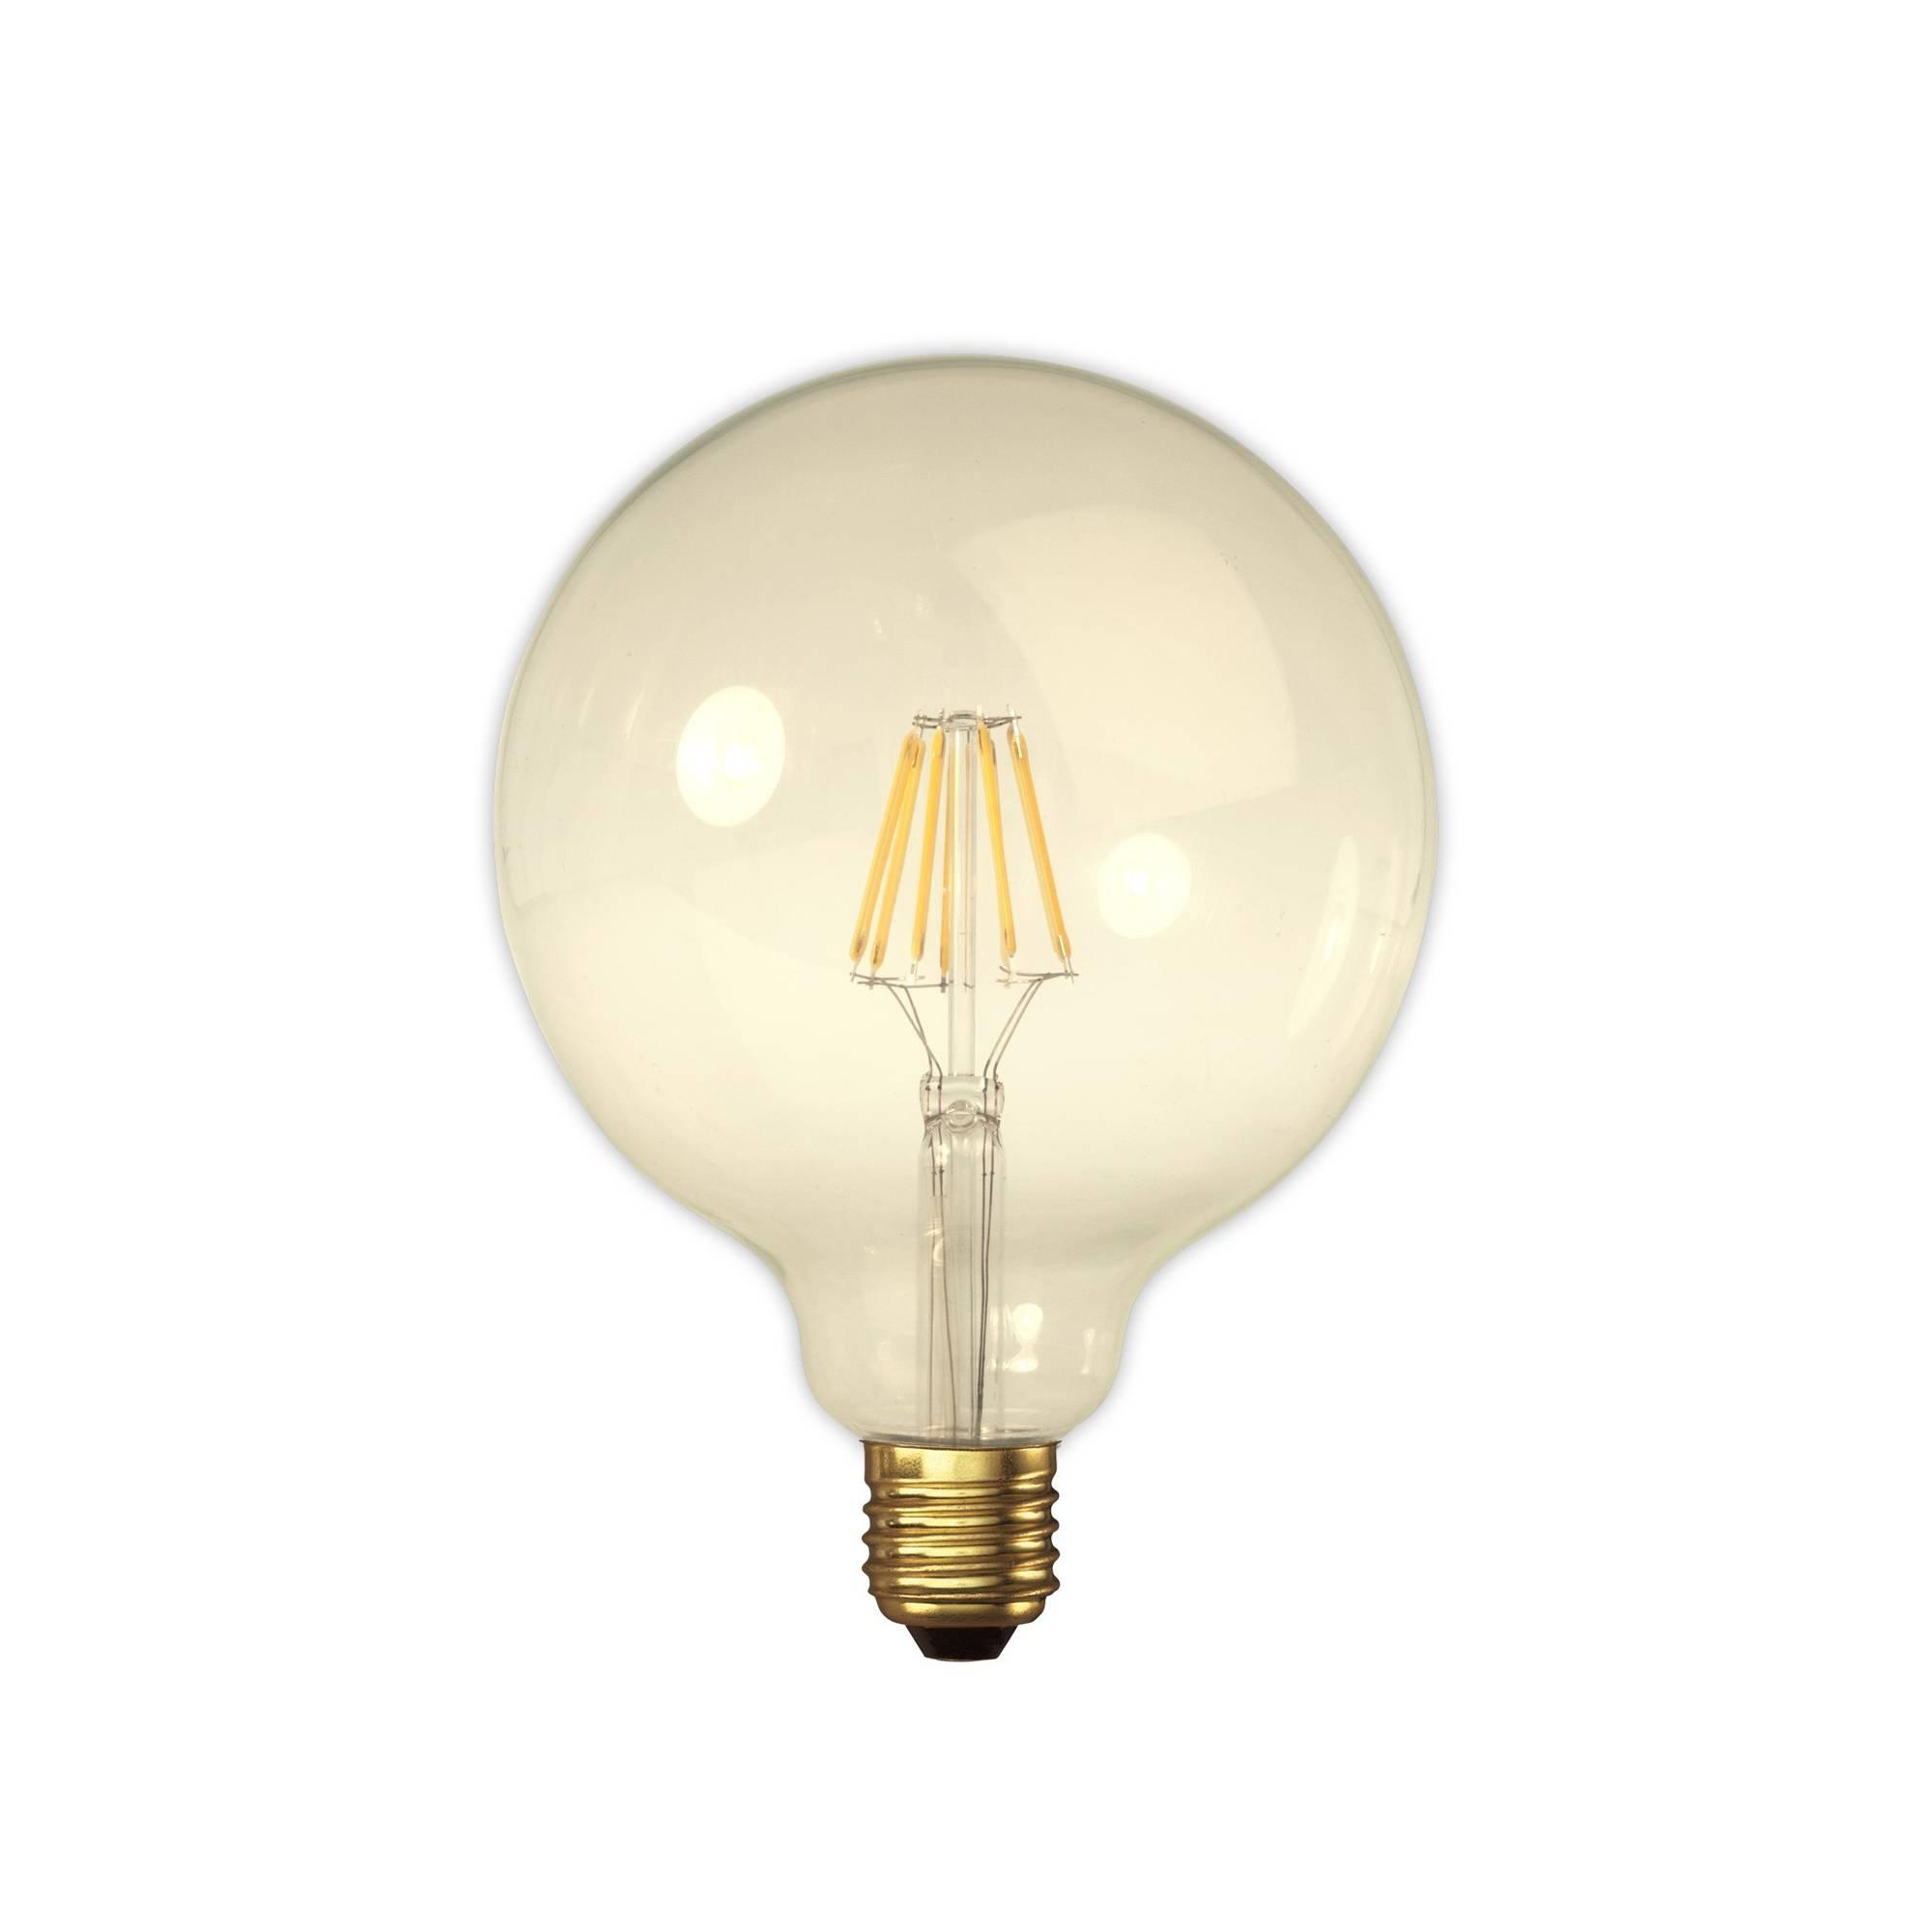 Ampoule globe or led avec culot e27 - Ampoule globe led ...